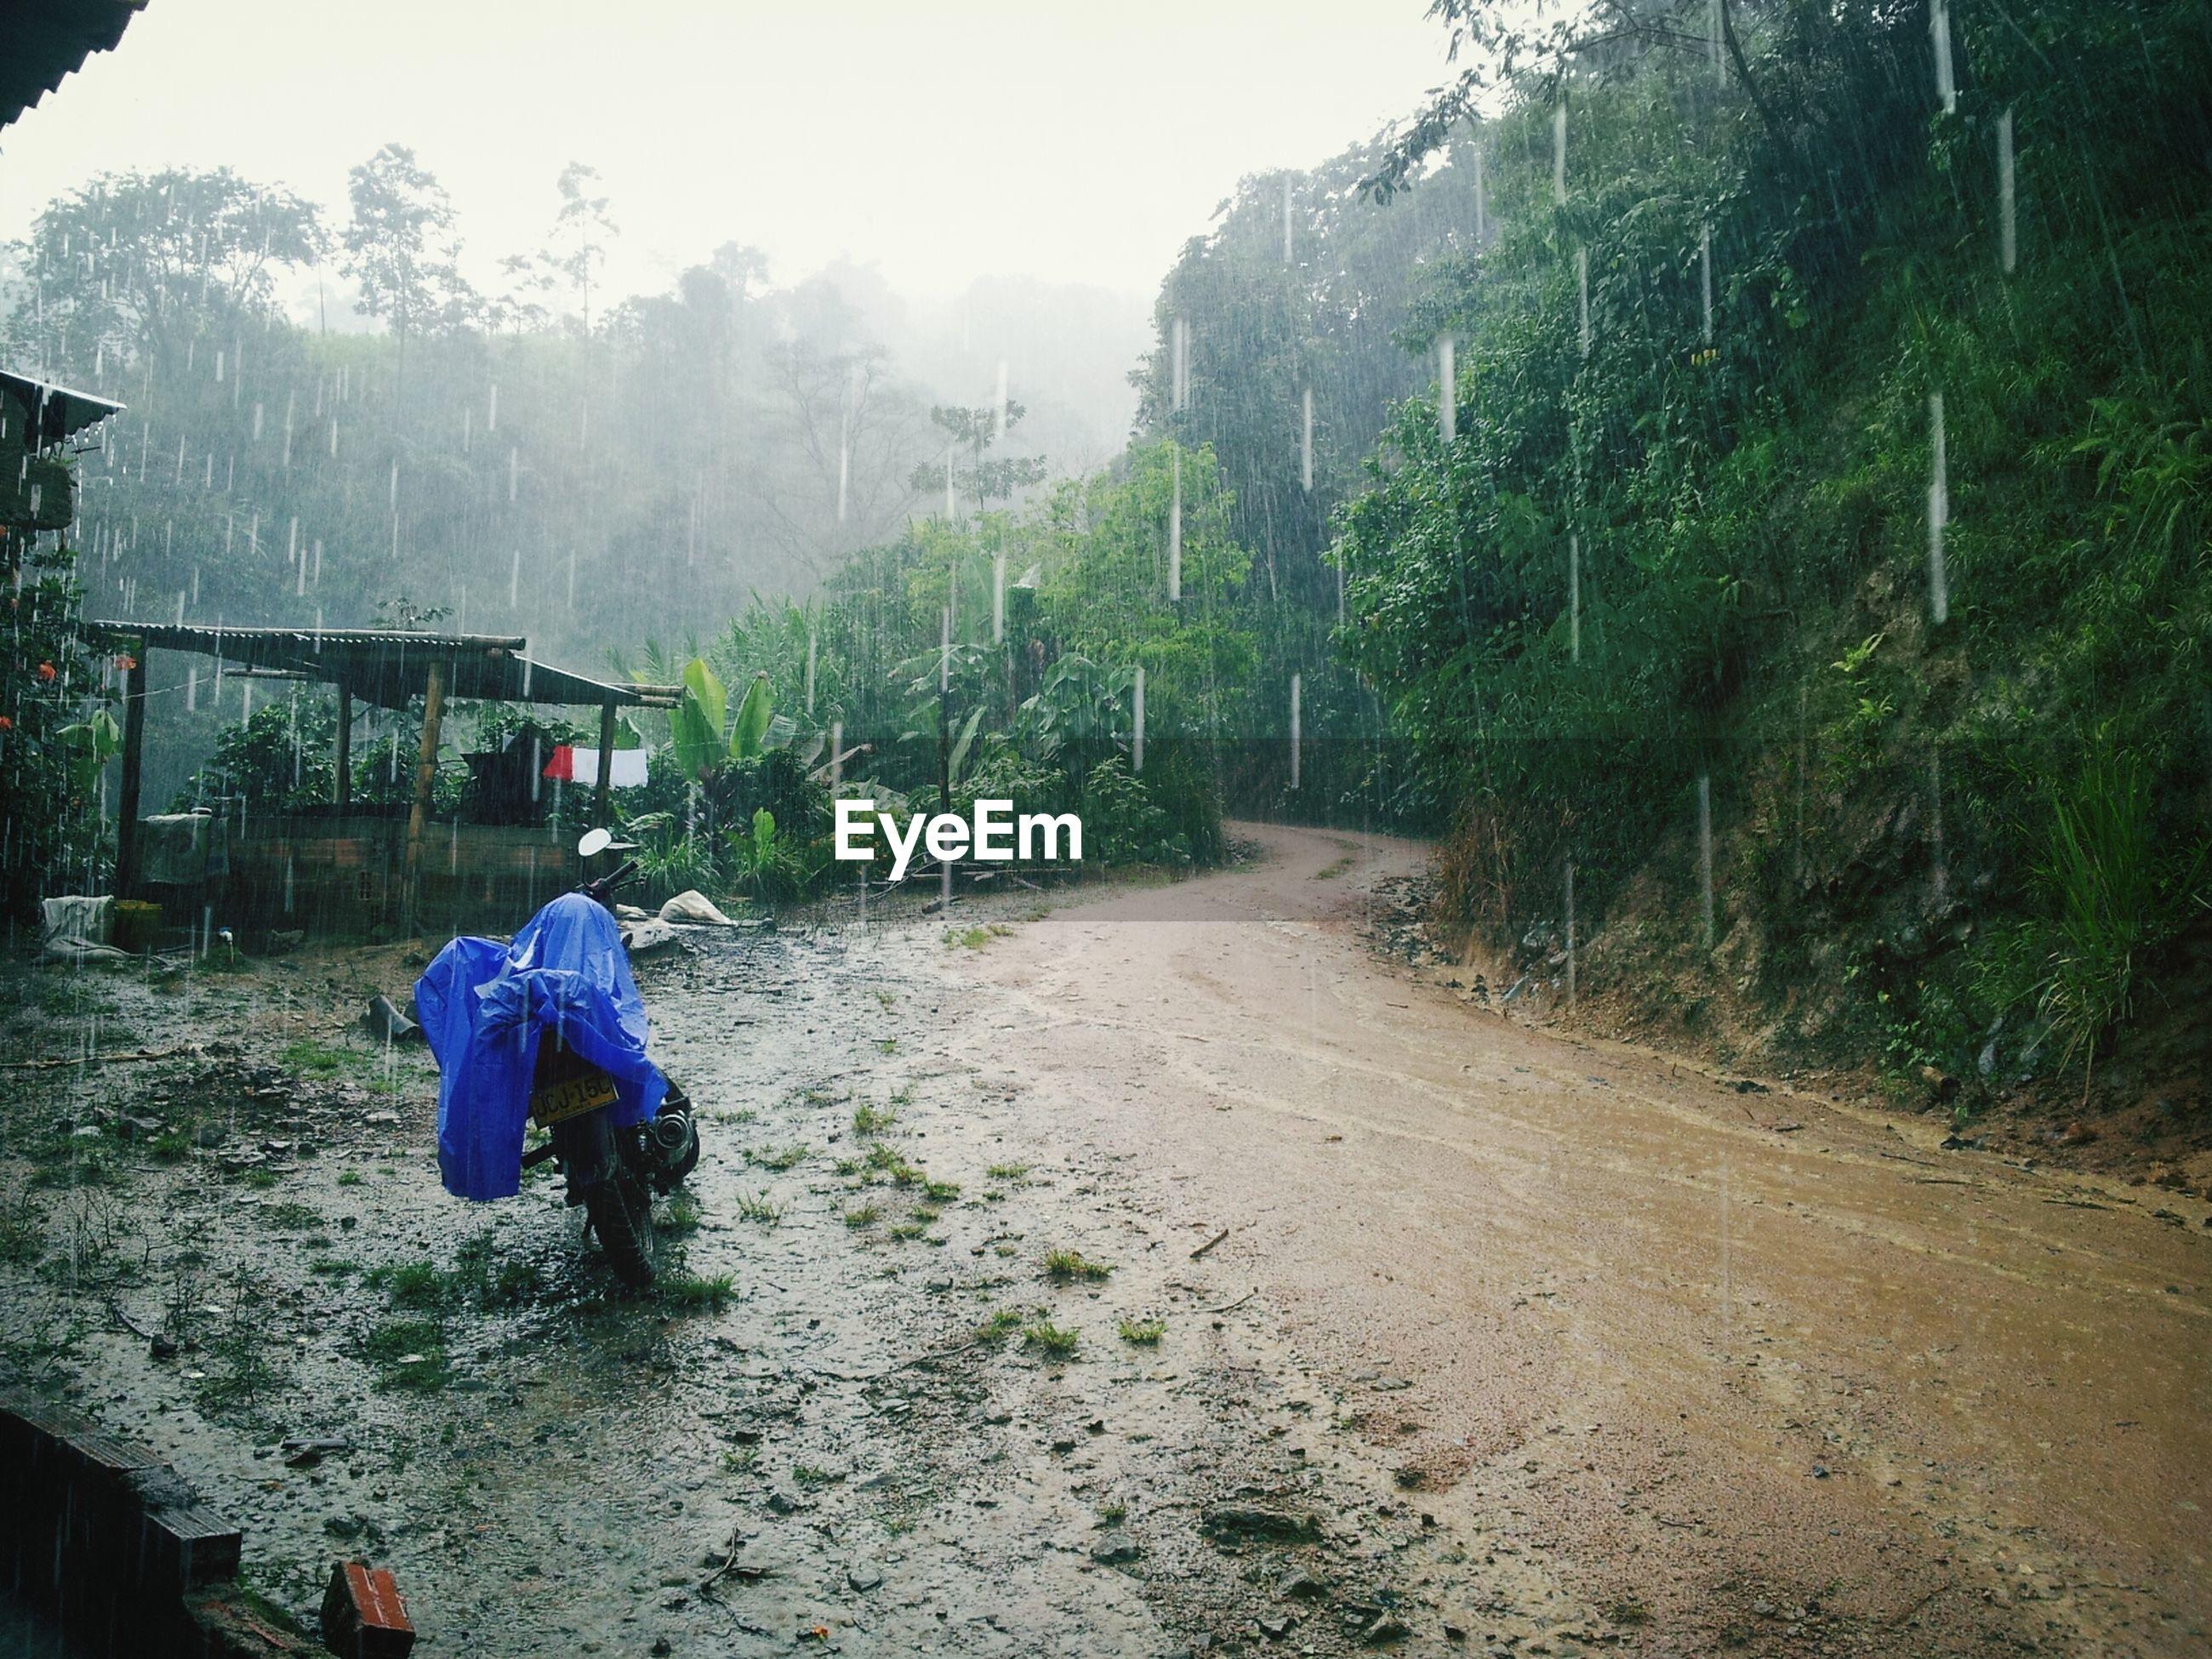 Empty muddy road along plants on a rainy day